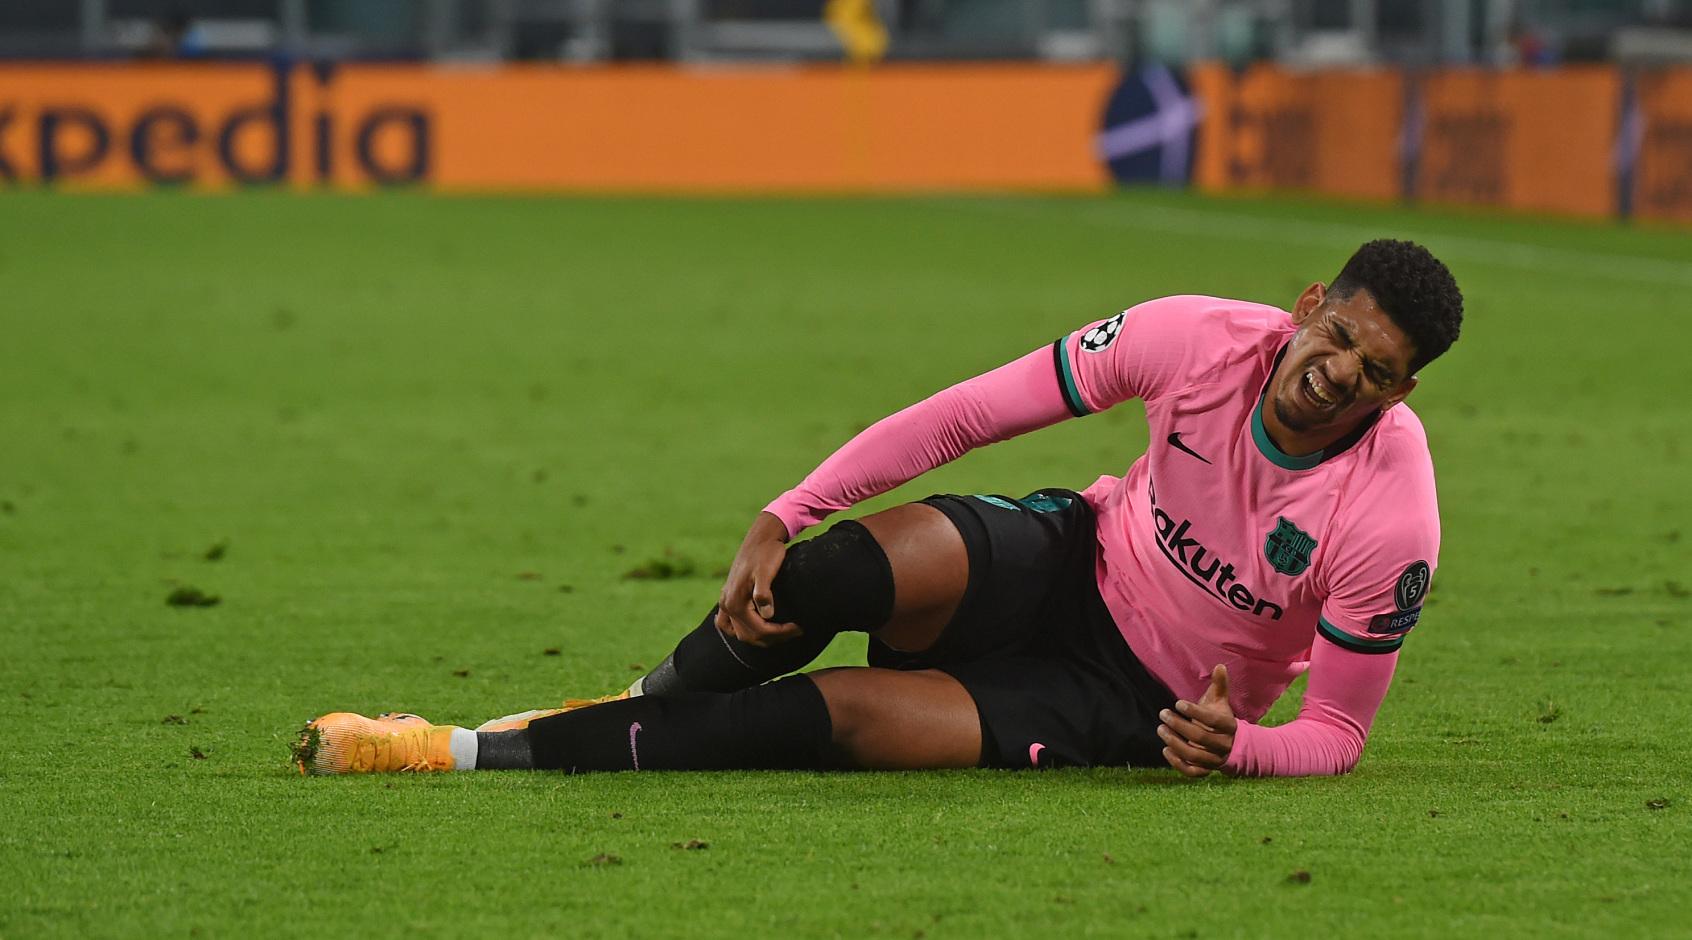 """Барселона"" подтвердила травму своего защитника"